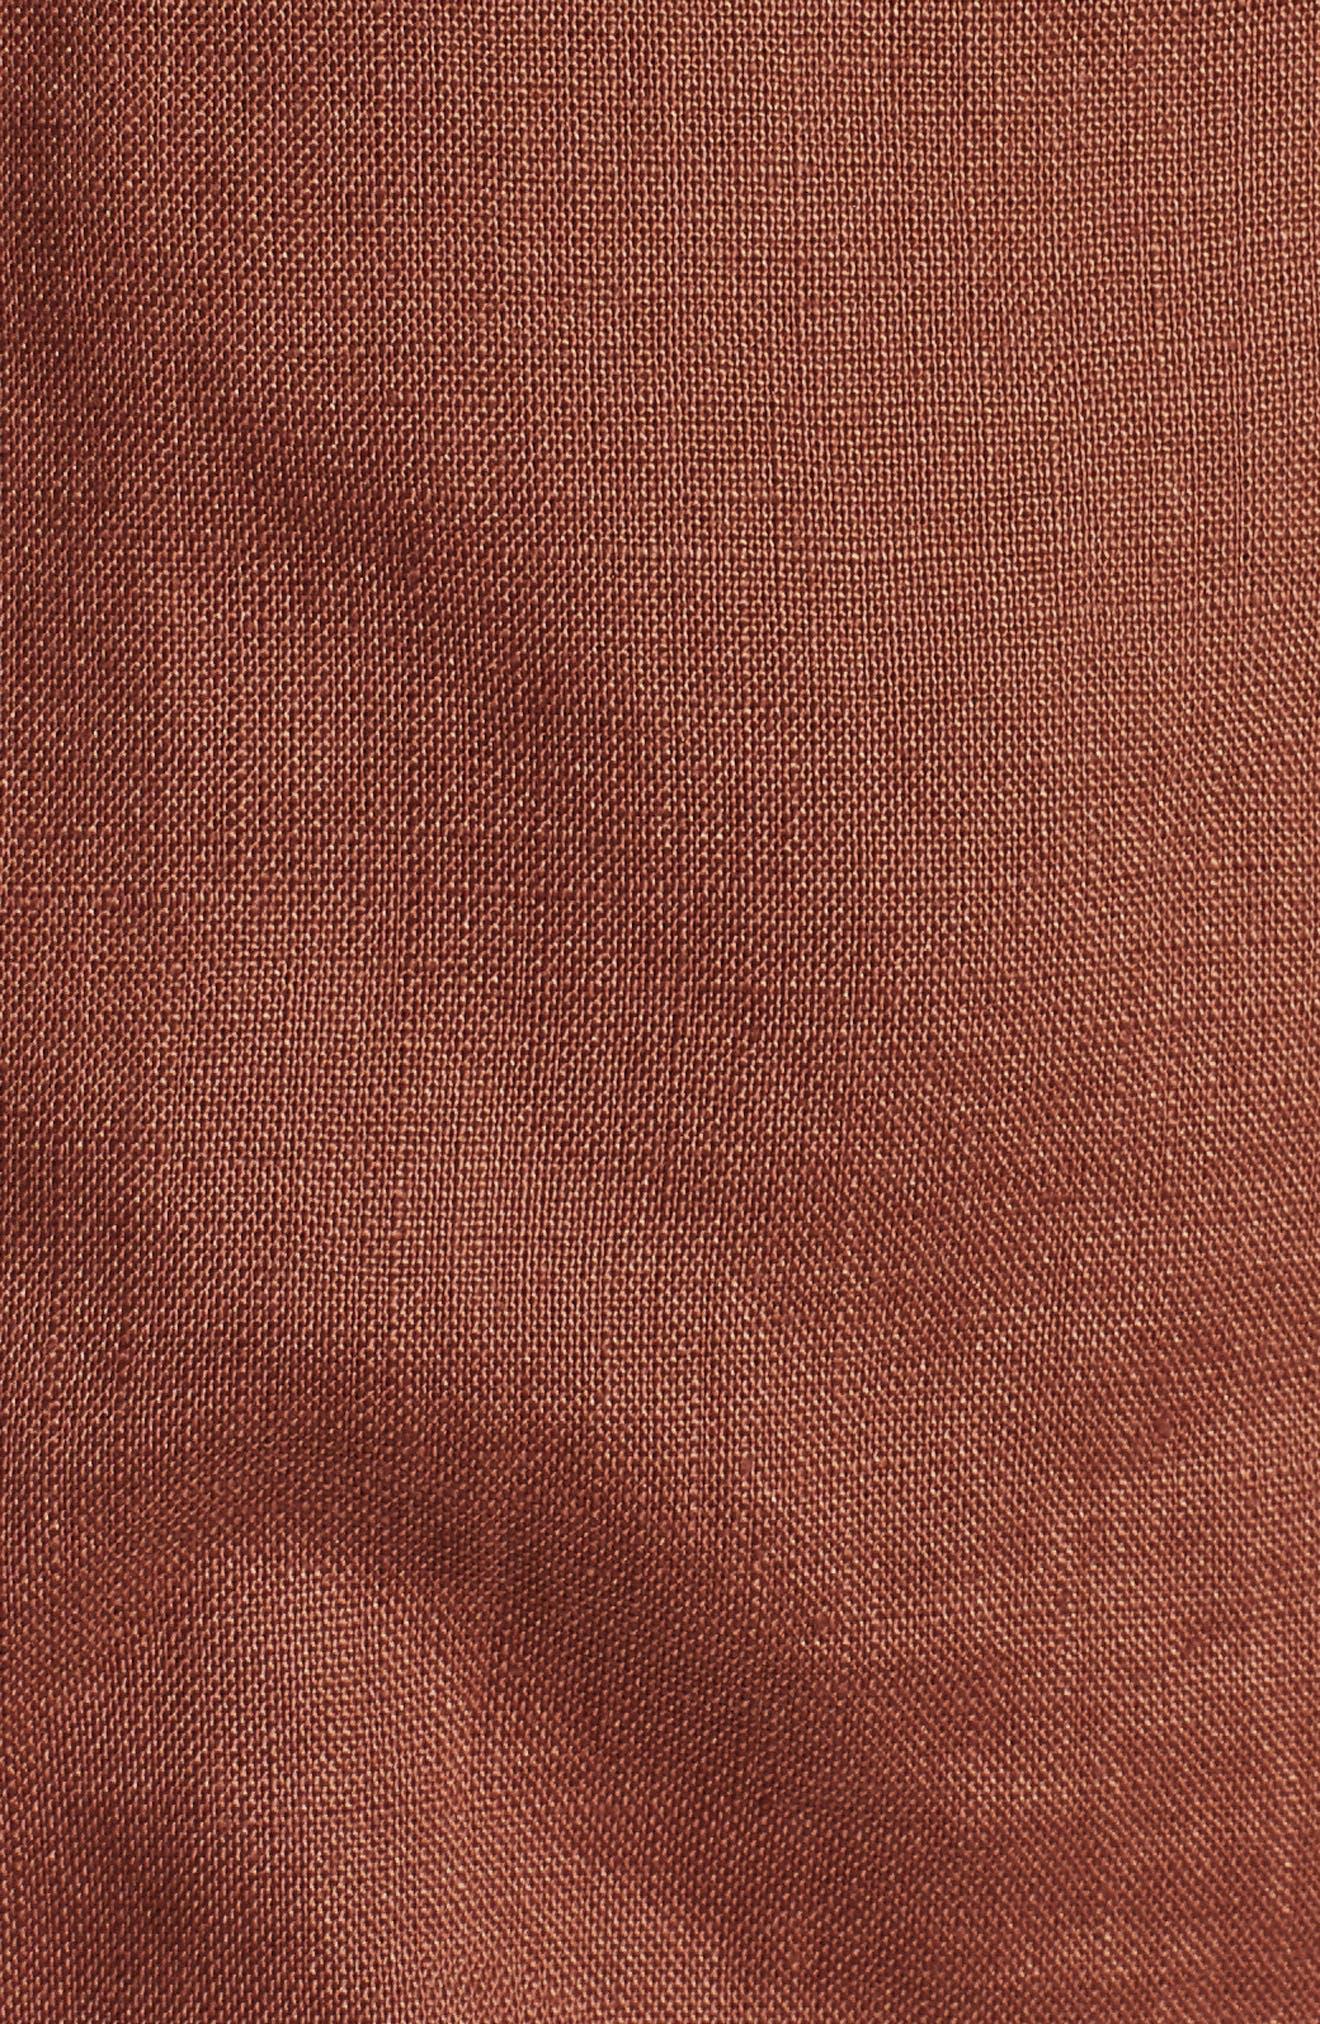 Organic Linen Blazer,                             Alternate thumbnail 19, color,